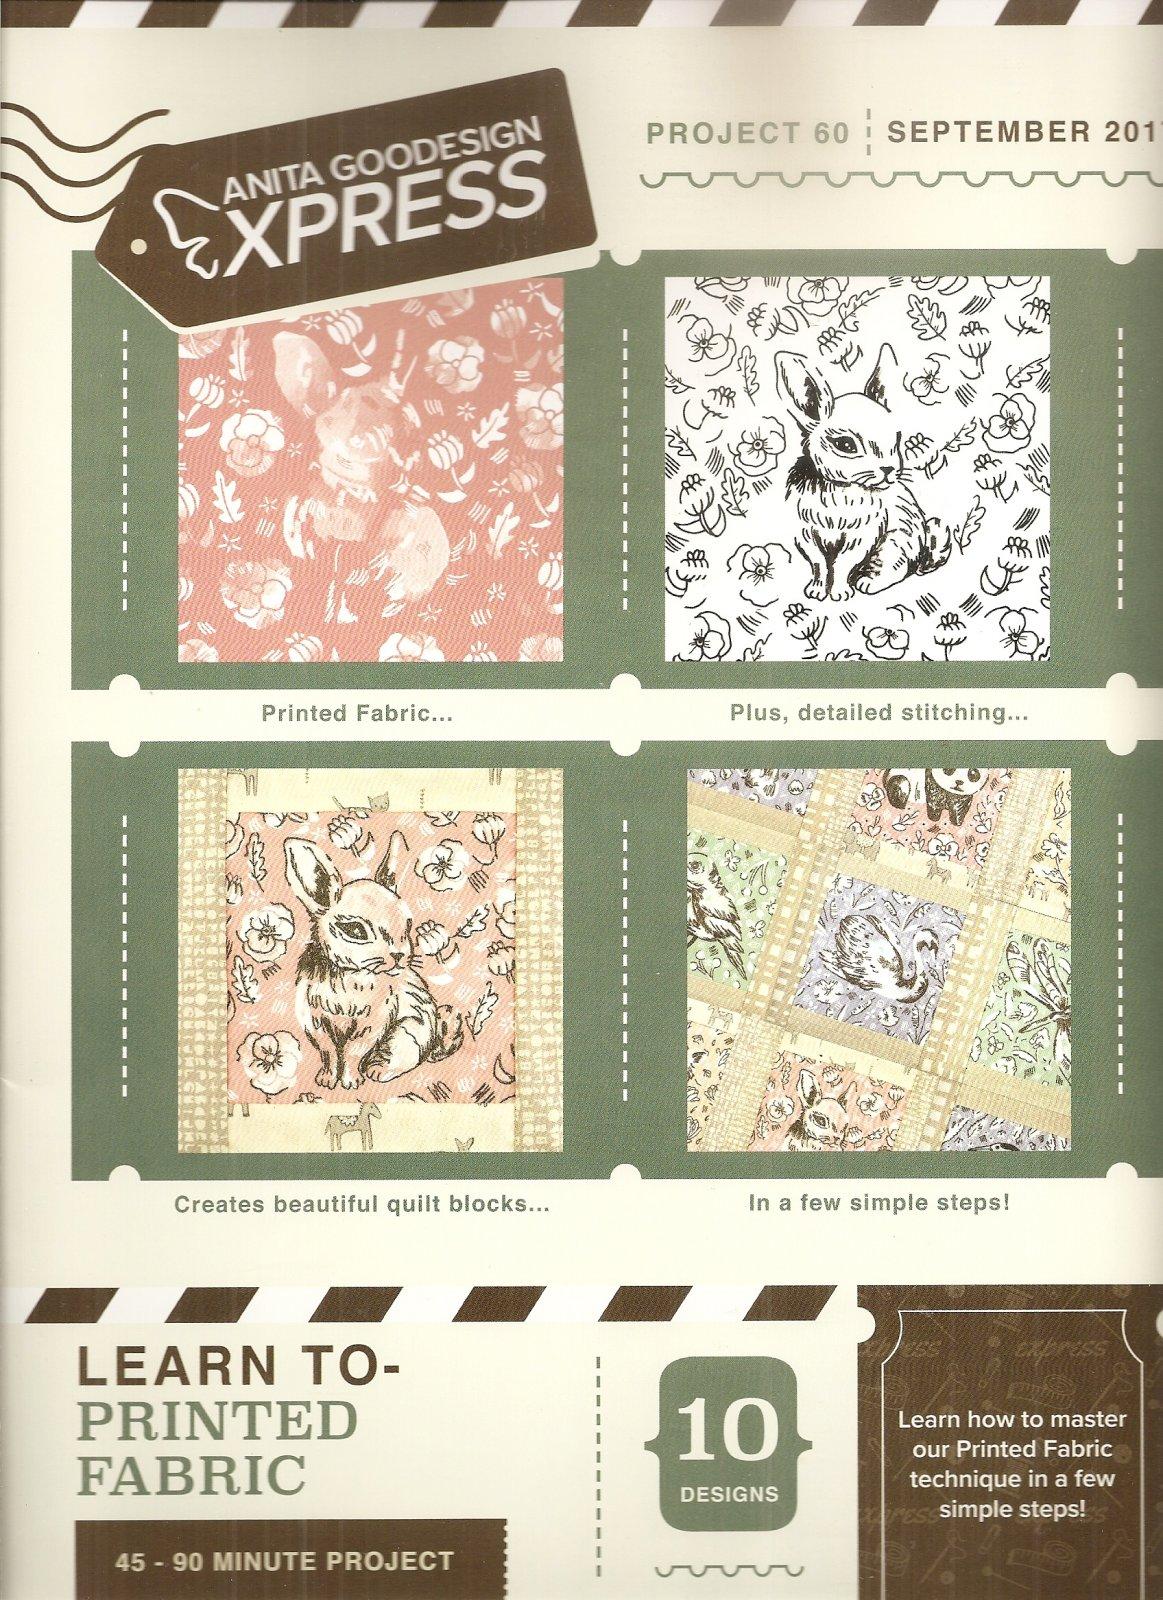 Anita Goodesign Express Learn to Print Fabric